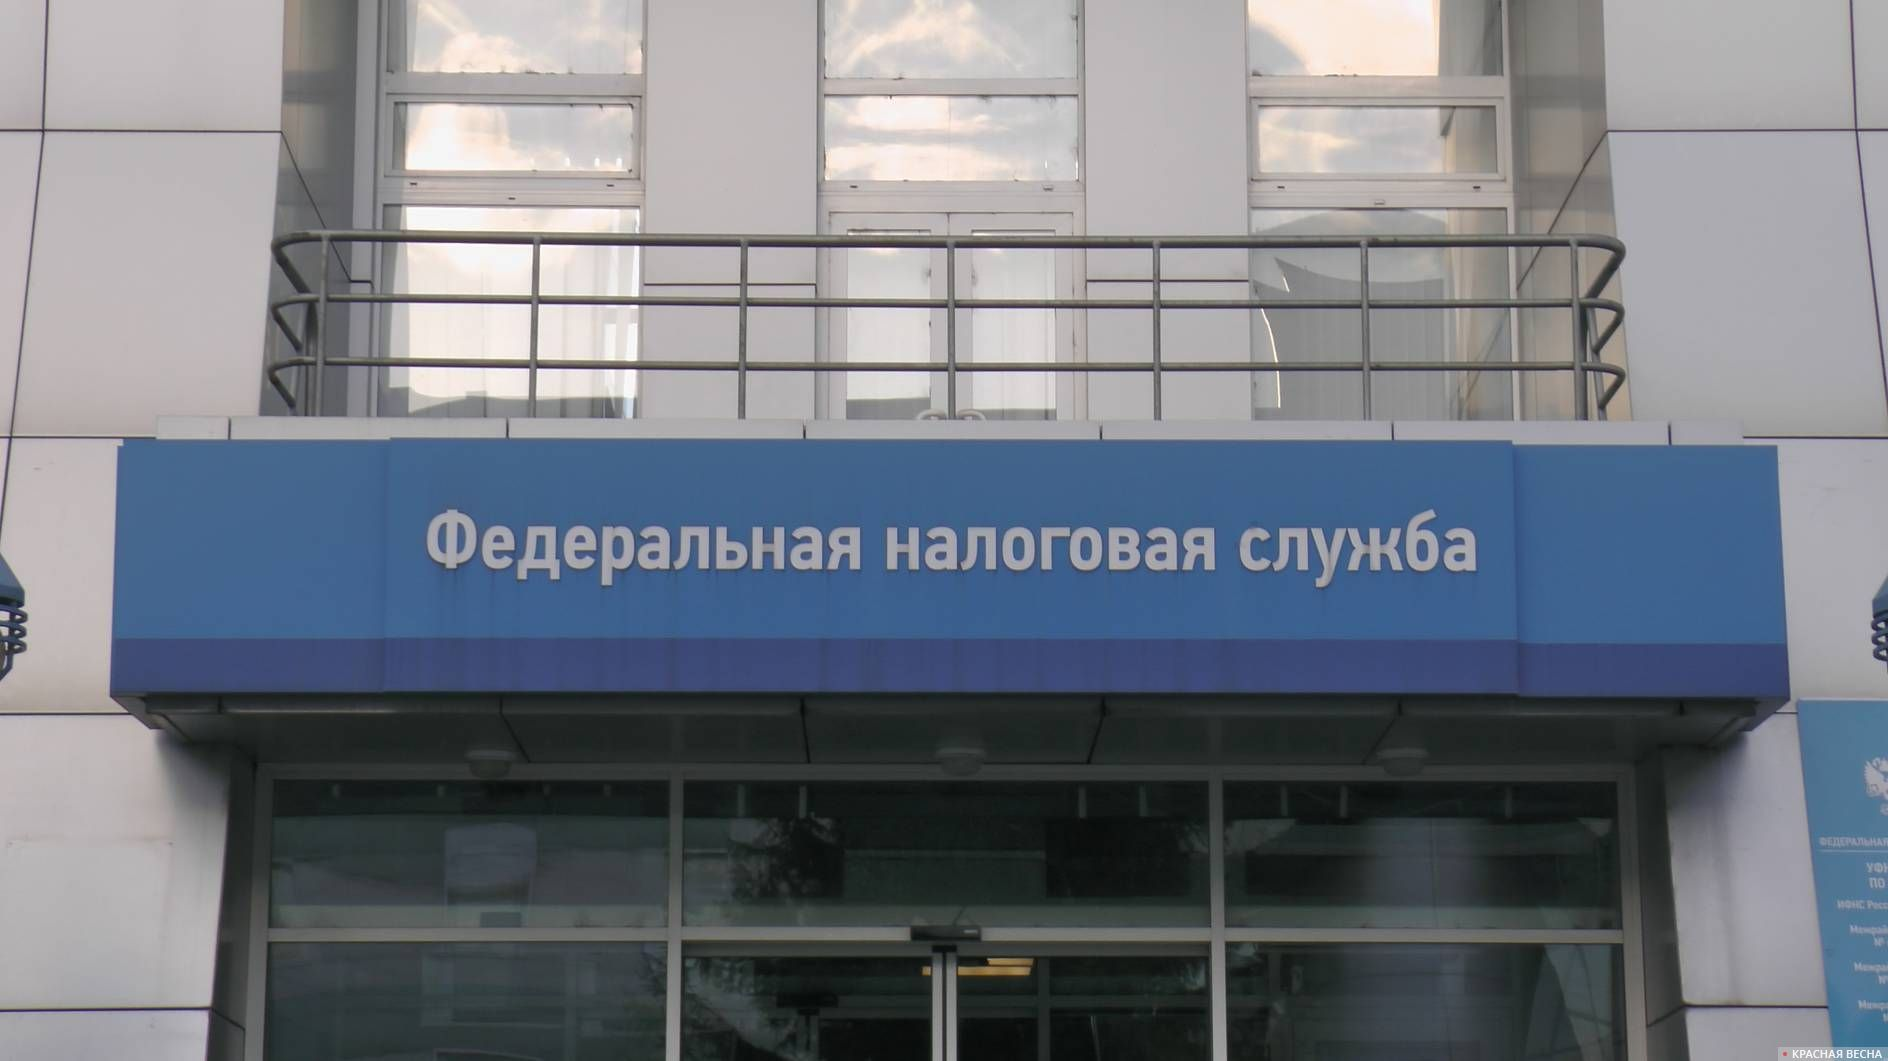 Налоговая служба. Москва